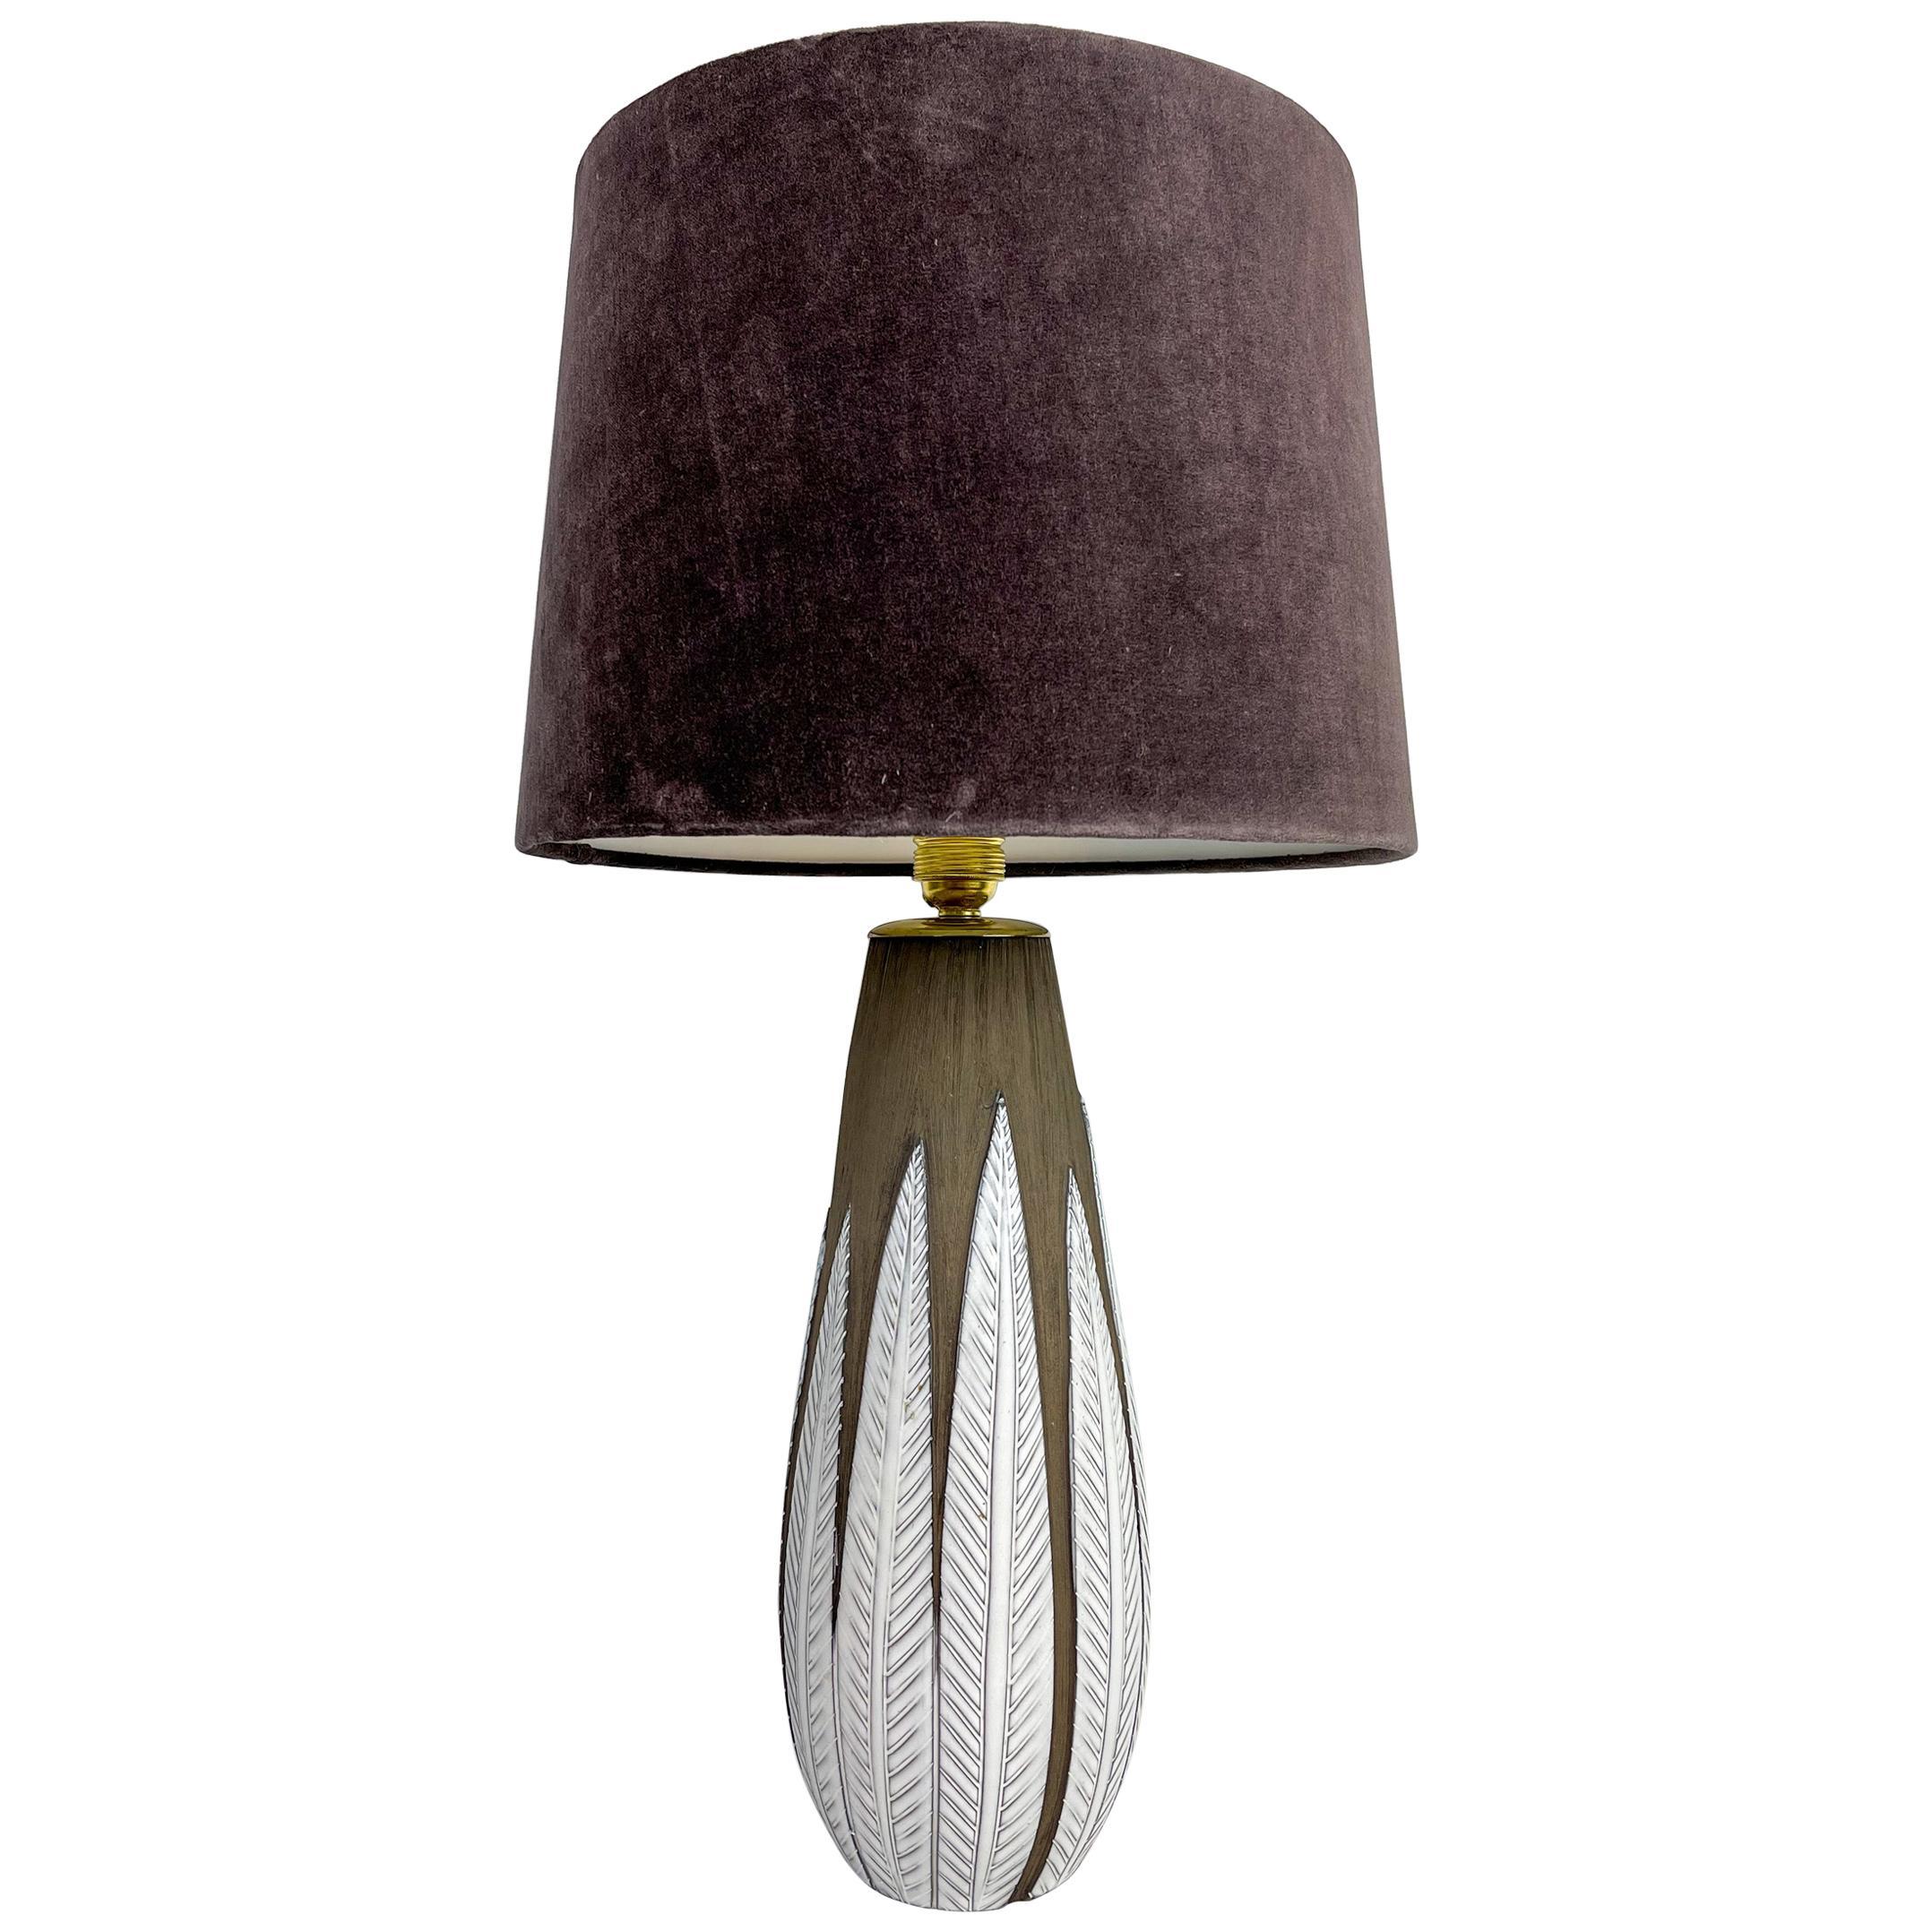 "Midcentury Ceramic Table Lamp ""Paprika""by Upsala Ekeby, Sweden, 1940s"